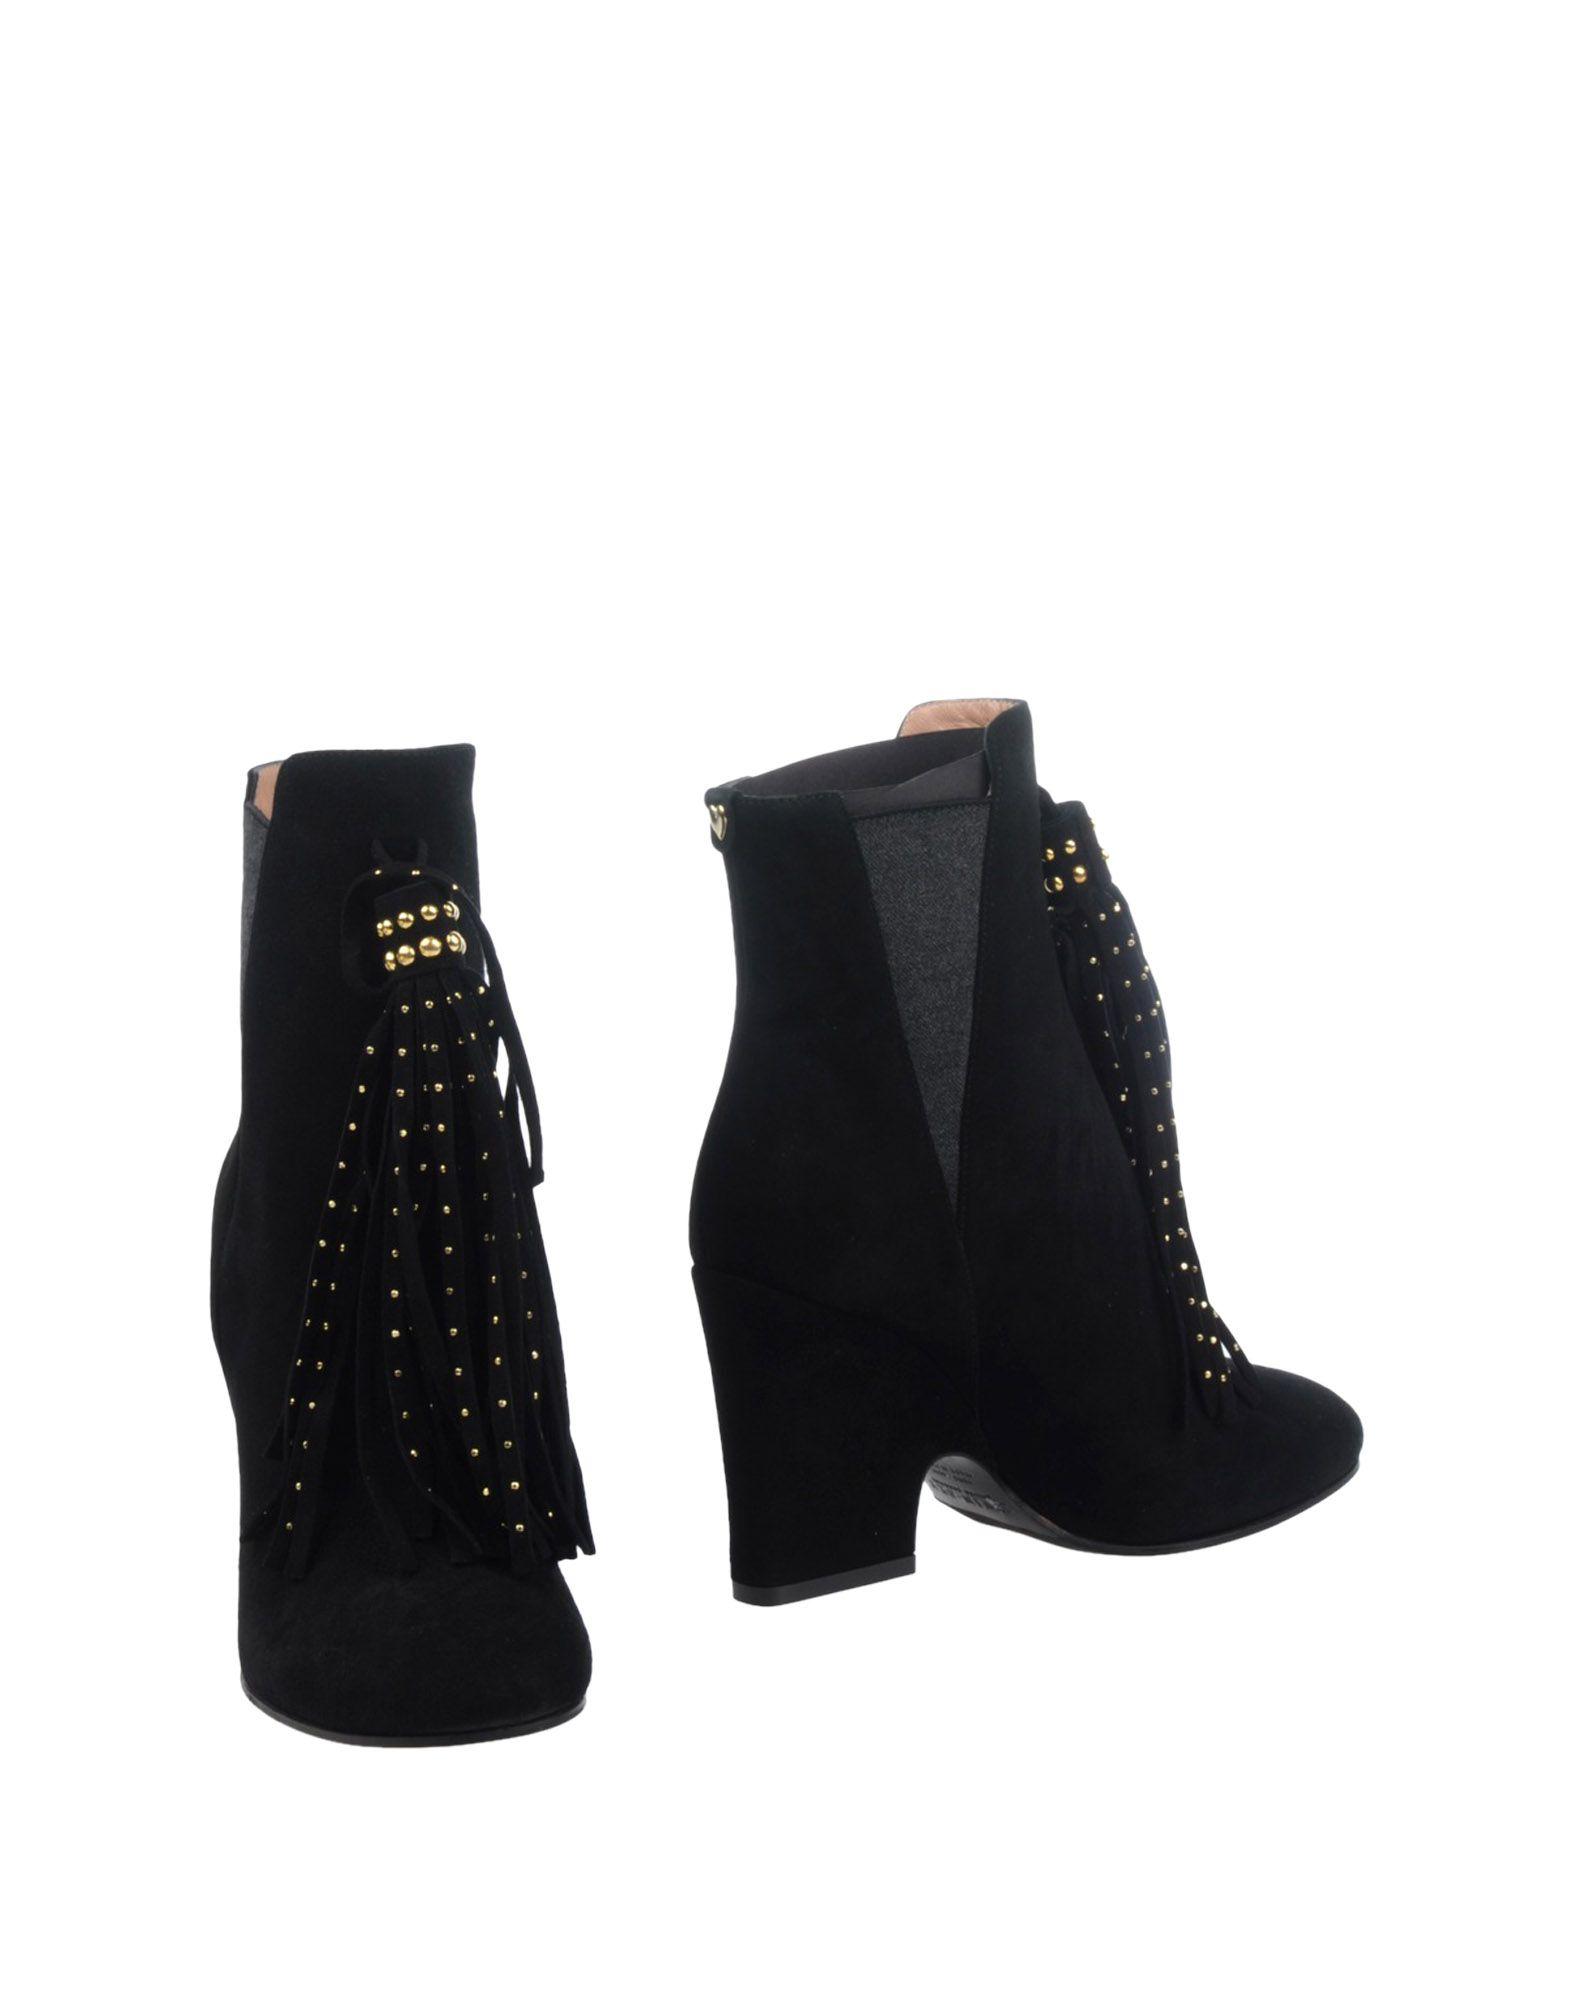 Haltbare Mode billige Schuhe Beliebte Twin 11277259JD Beliebte Schuhe Schuhe d7b0b1